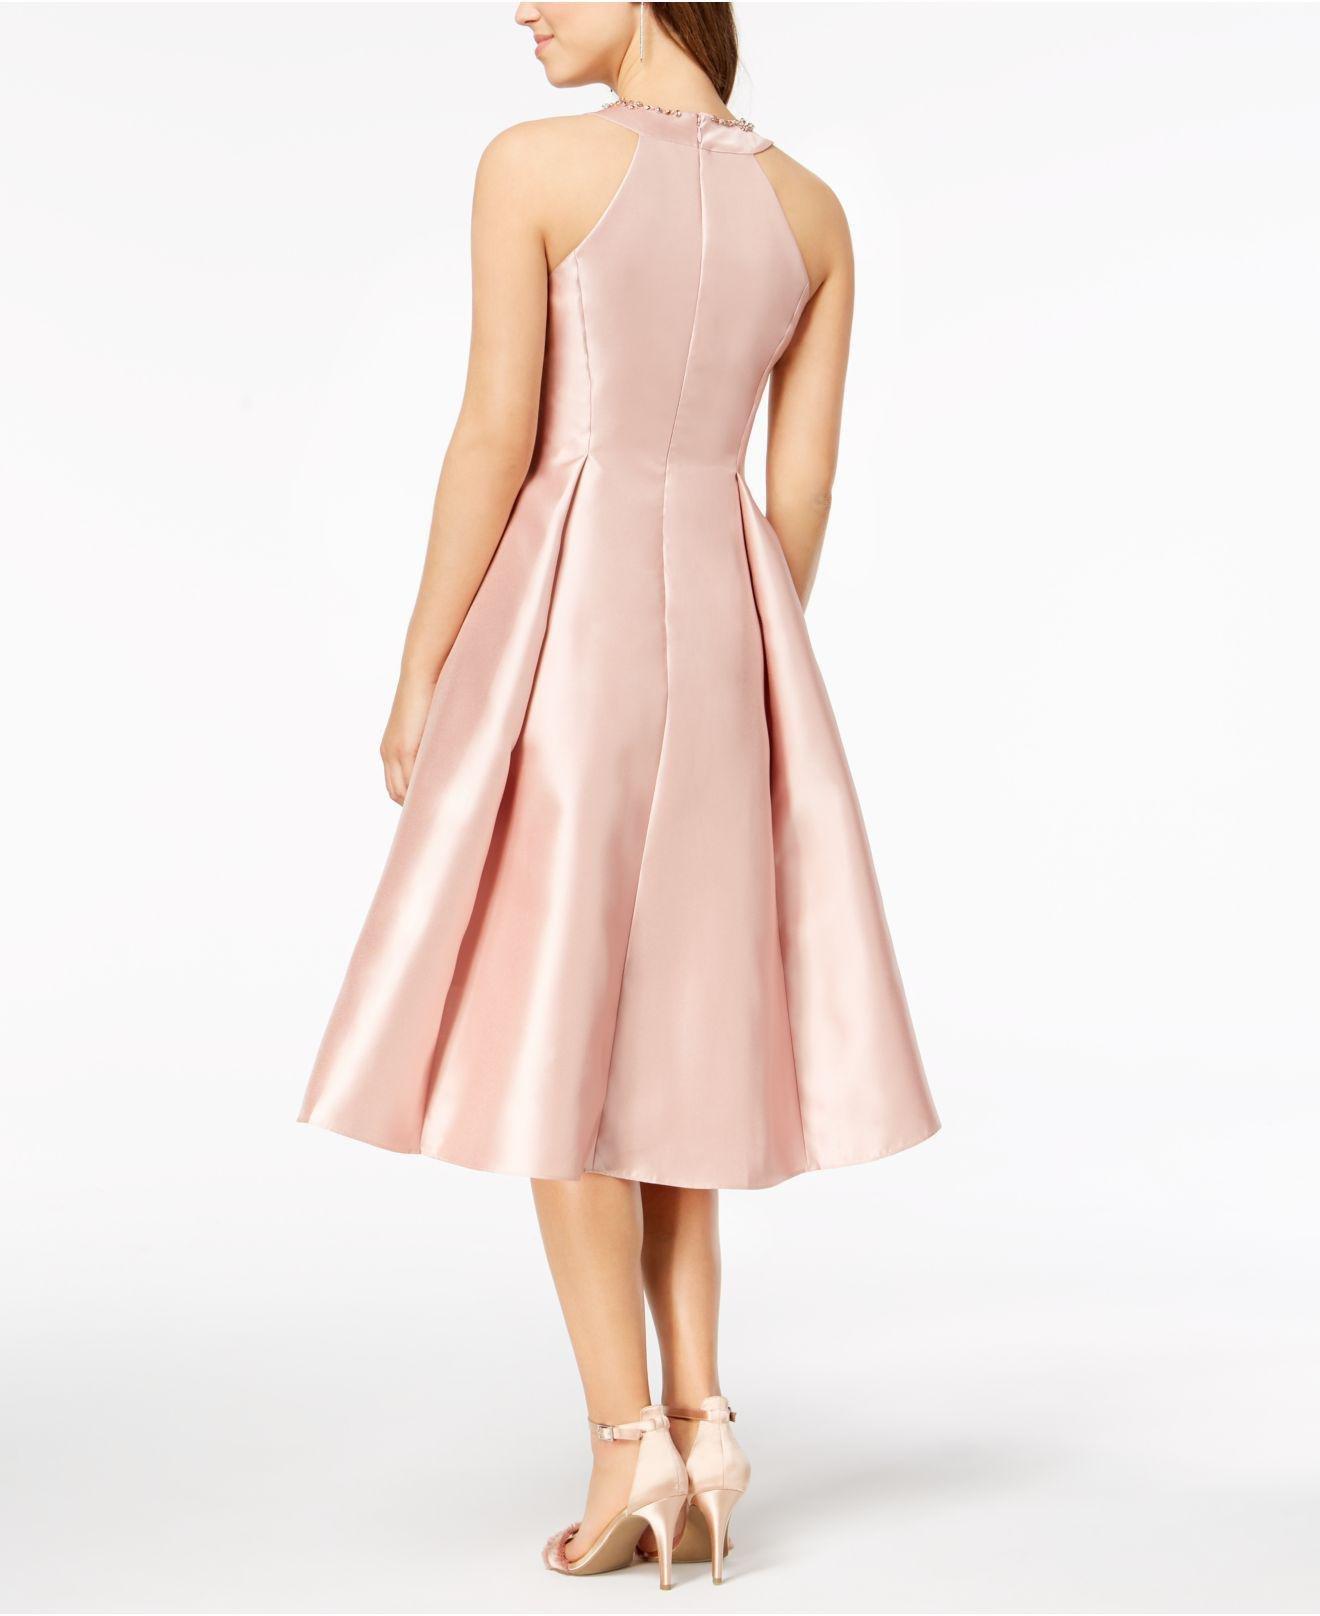 cb342c2fe9ba3 Lyst - Adrianna Papell Rhinestone High-low Dress in Pink